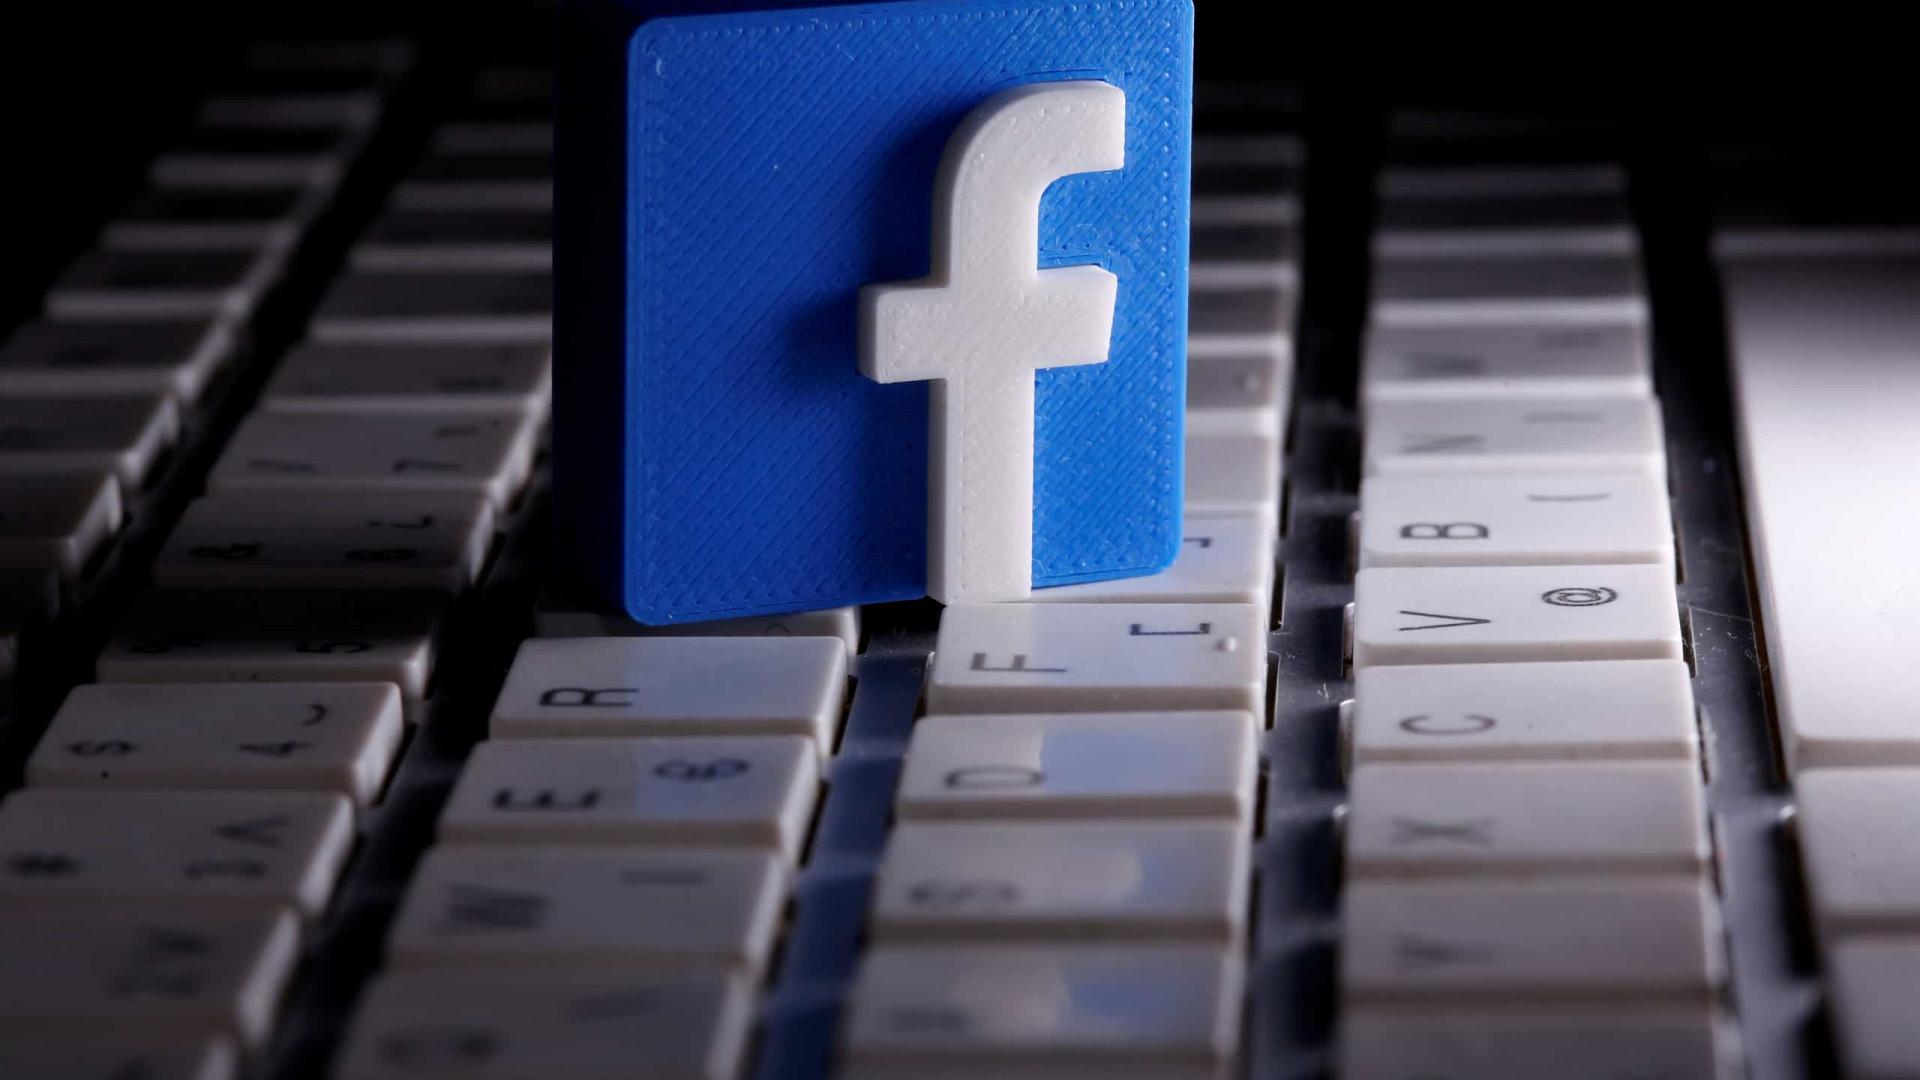 Procon-SP notifica Facebook sobre suposto vazamento de dados de usuários